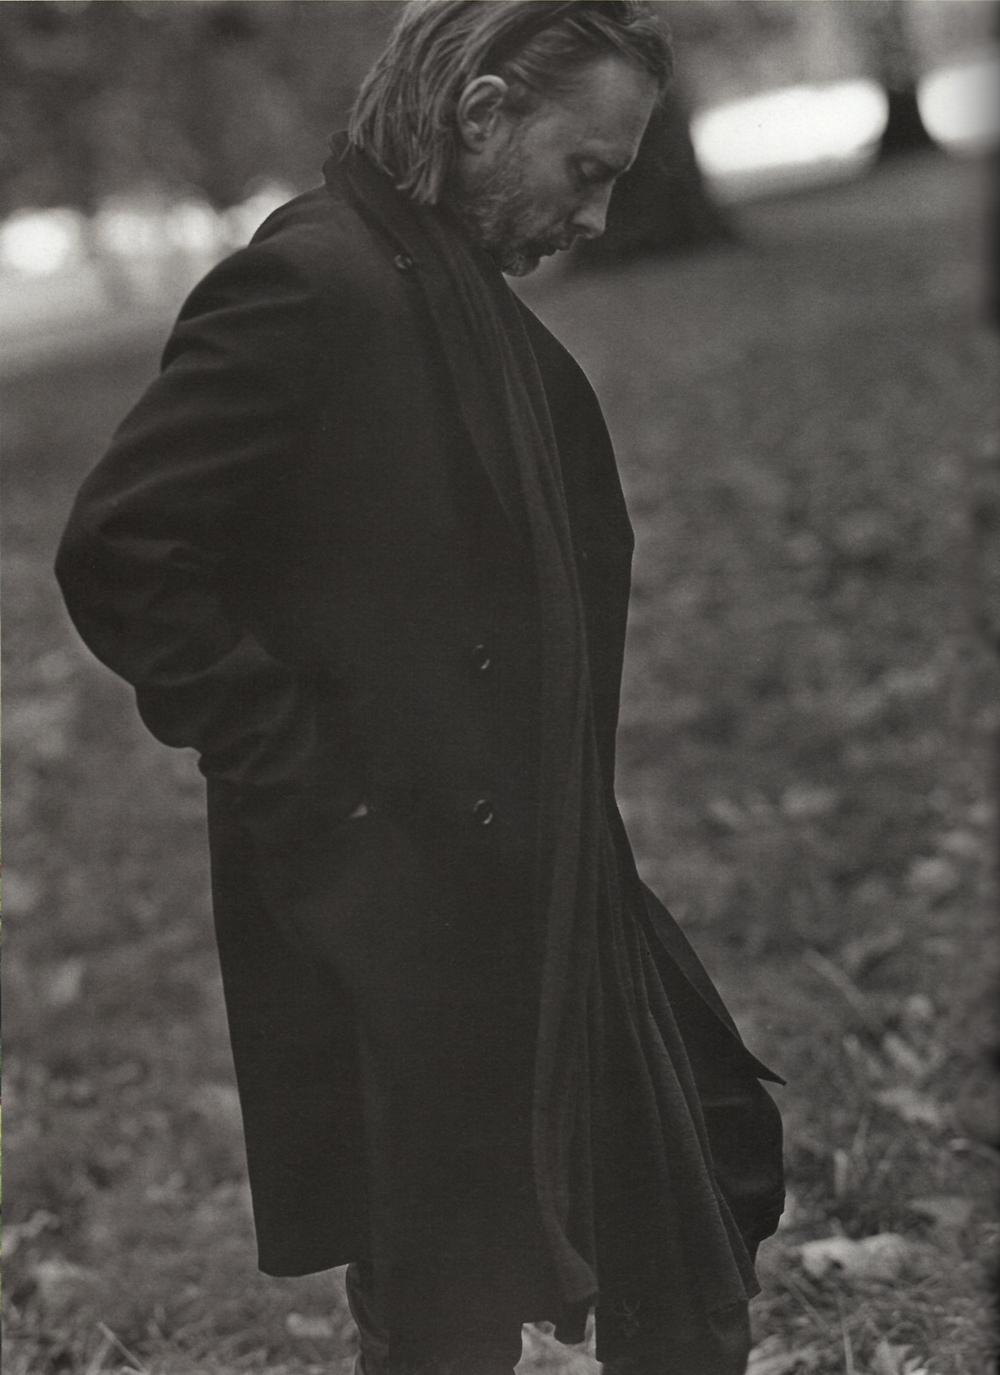 Tom Yorke